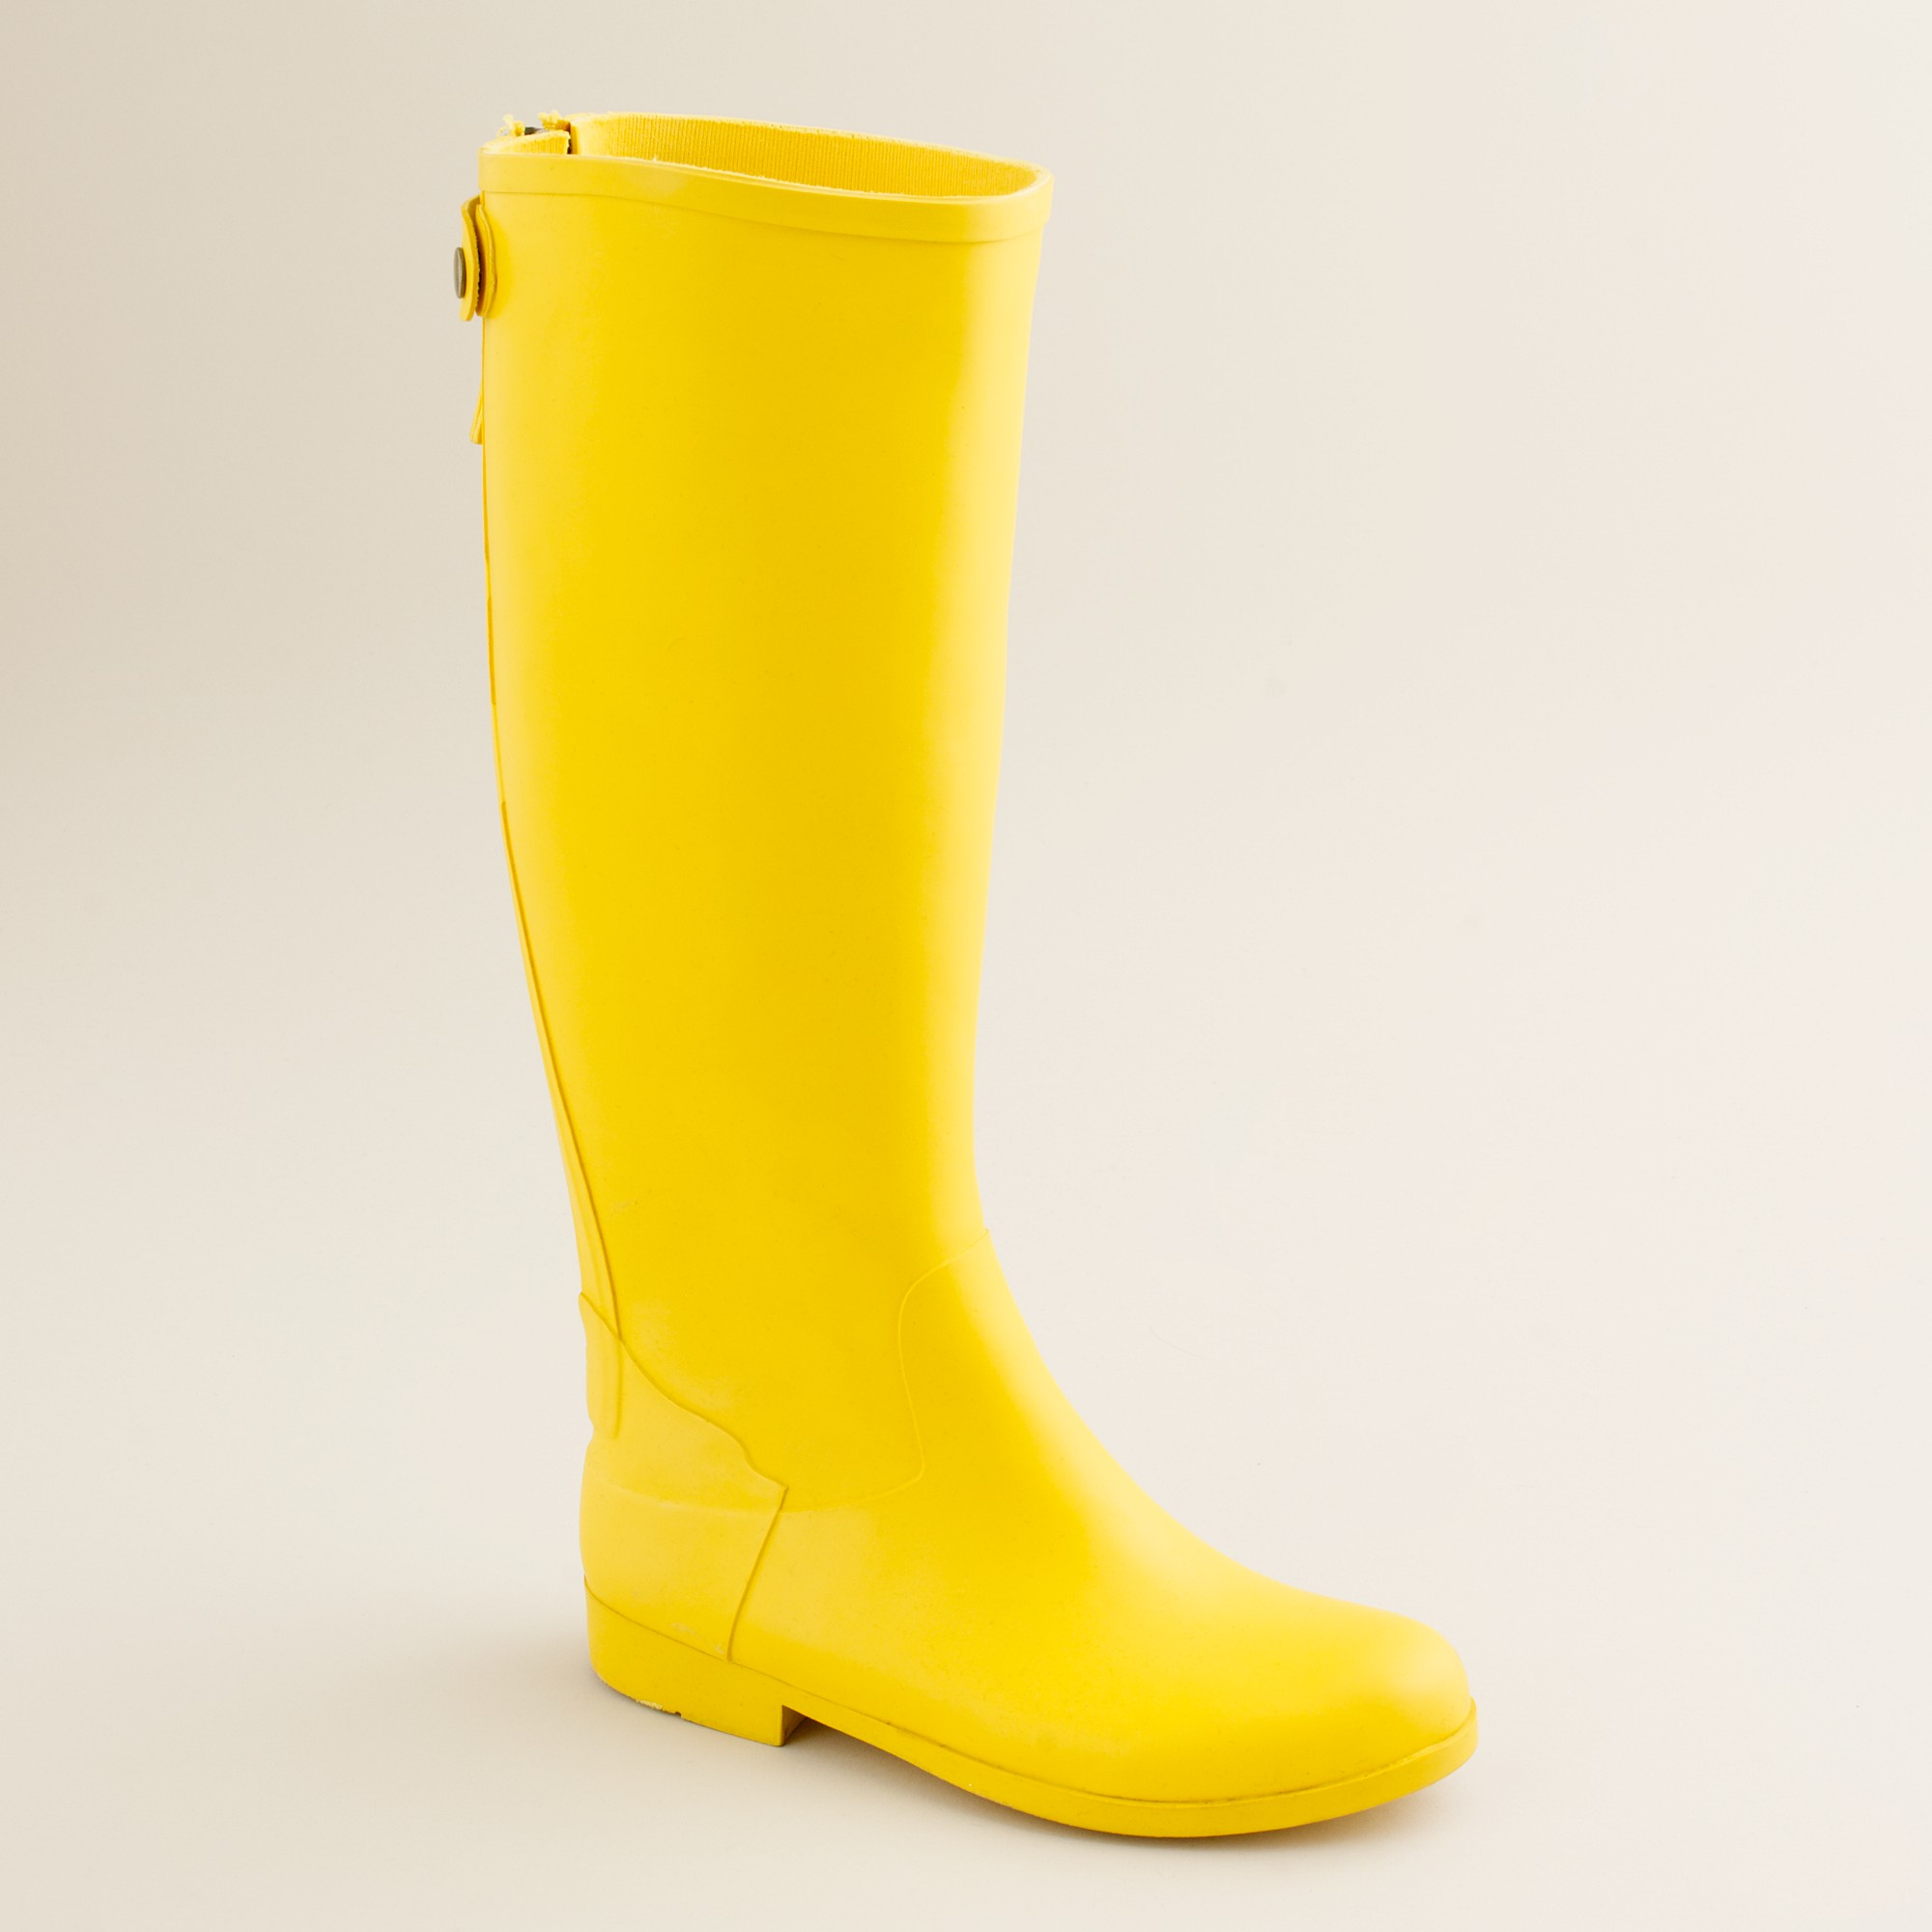 J Crew Weatherby Rain Boots In Yellow Warm Mustard Lyst